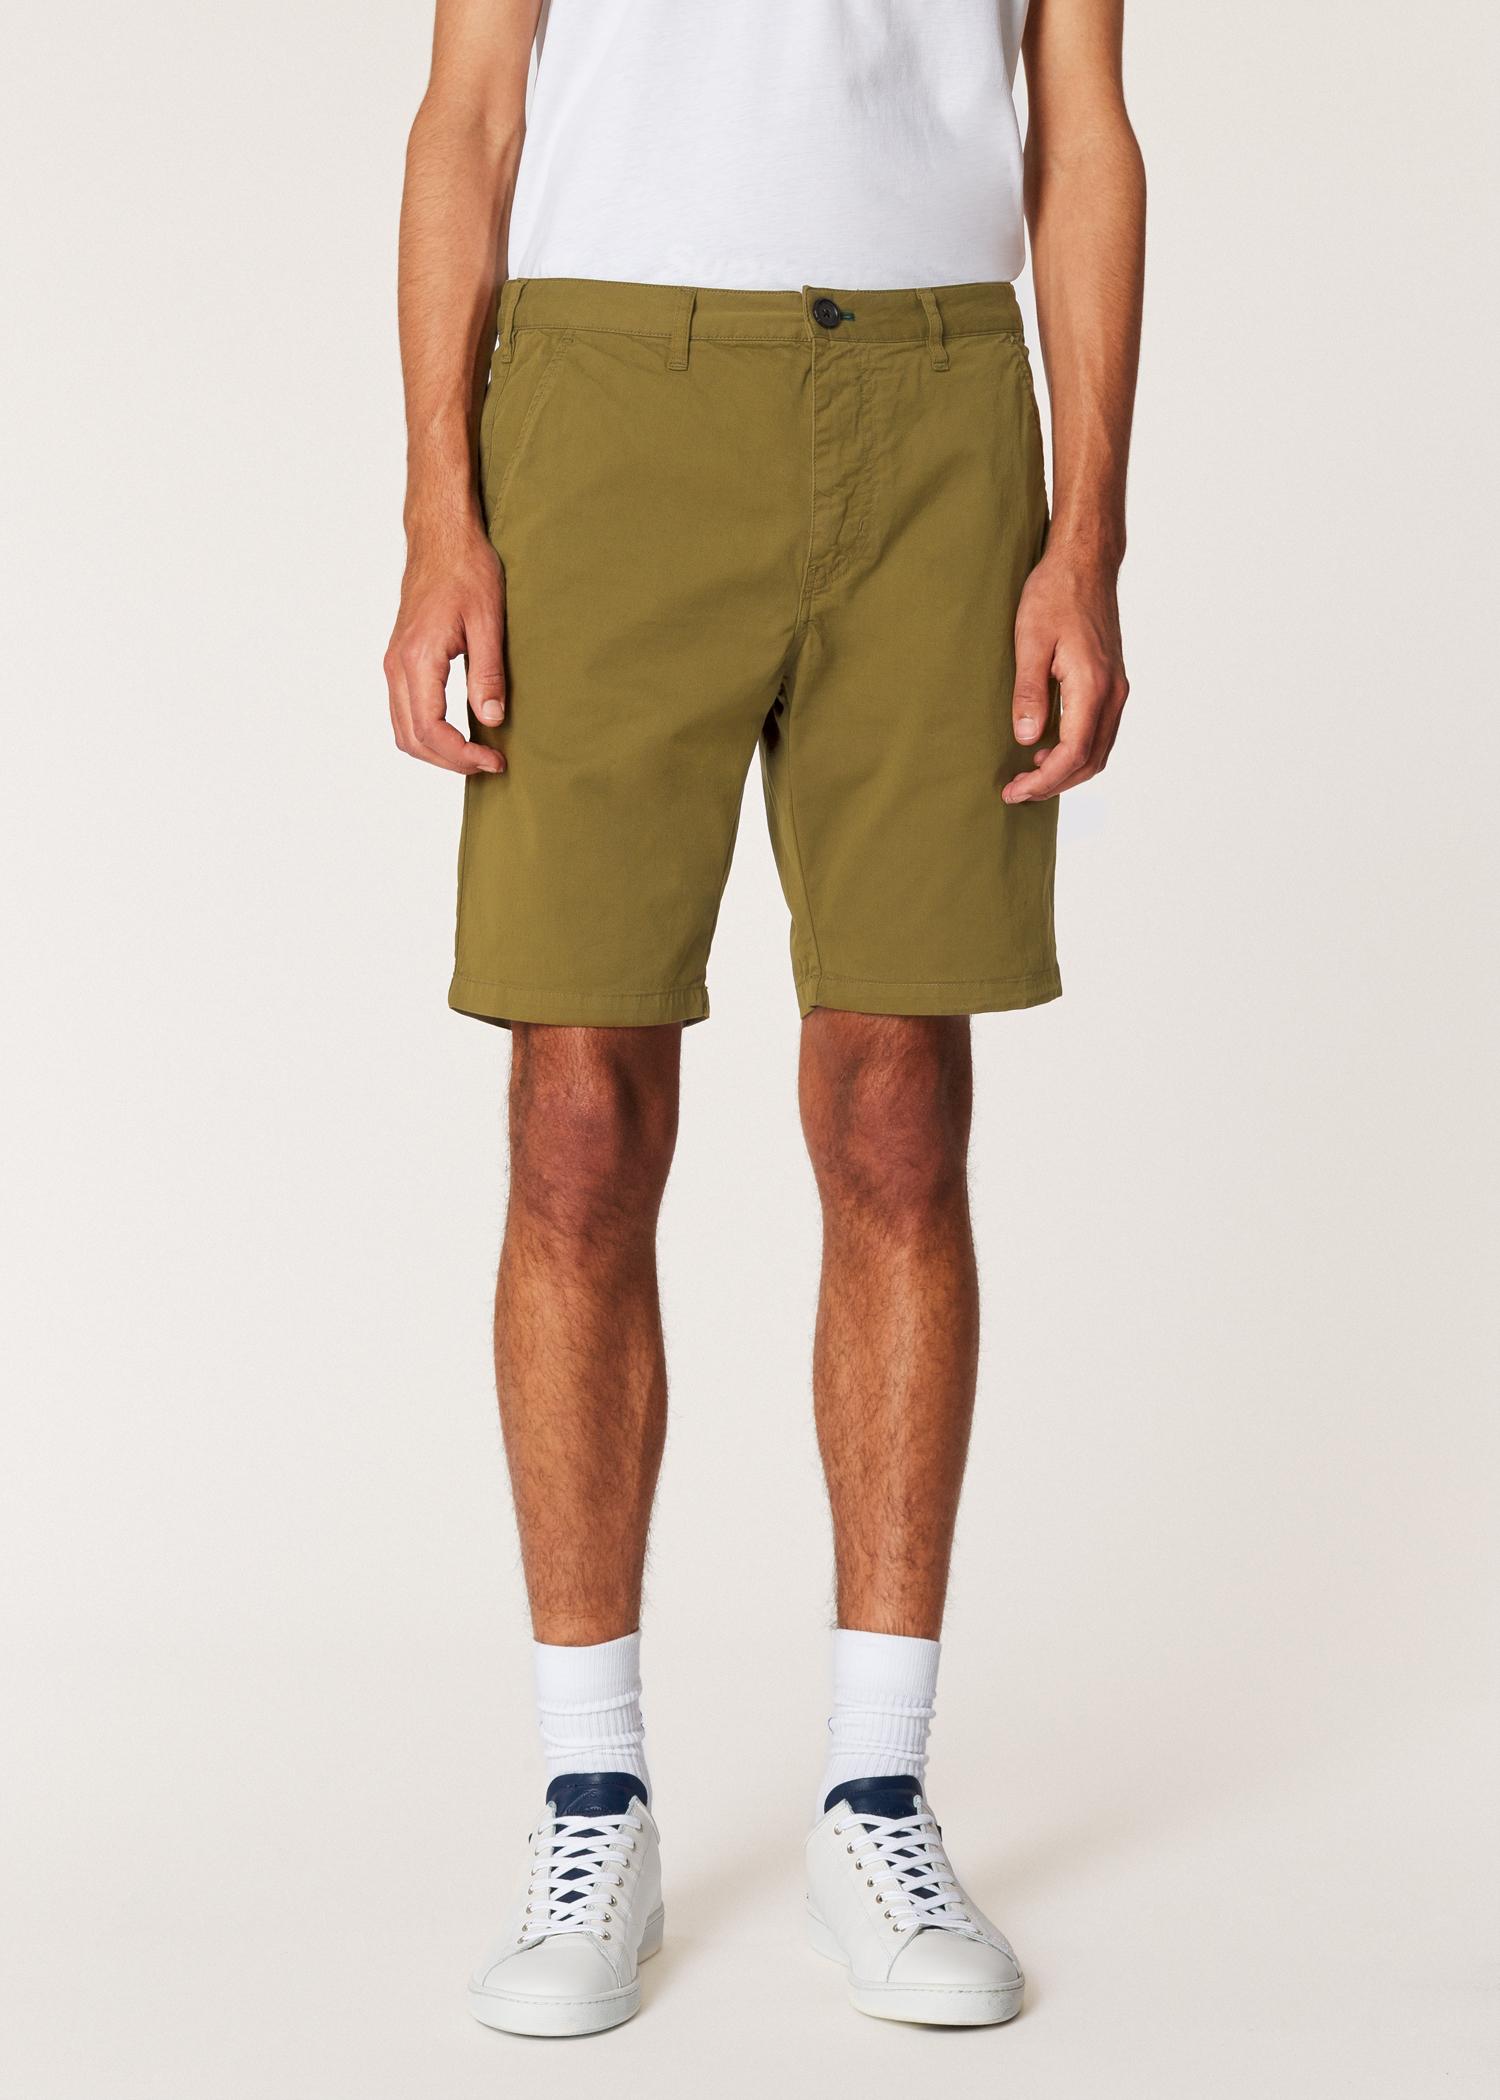 8daec68273bc9b Model front close up - Men's Khaki Garment-Dyed Stretch Pima-Cotton Shorts  Paul